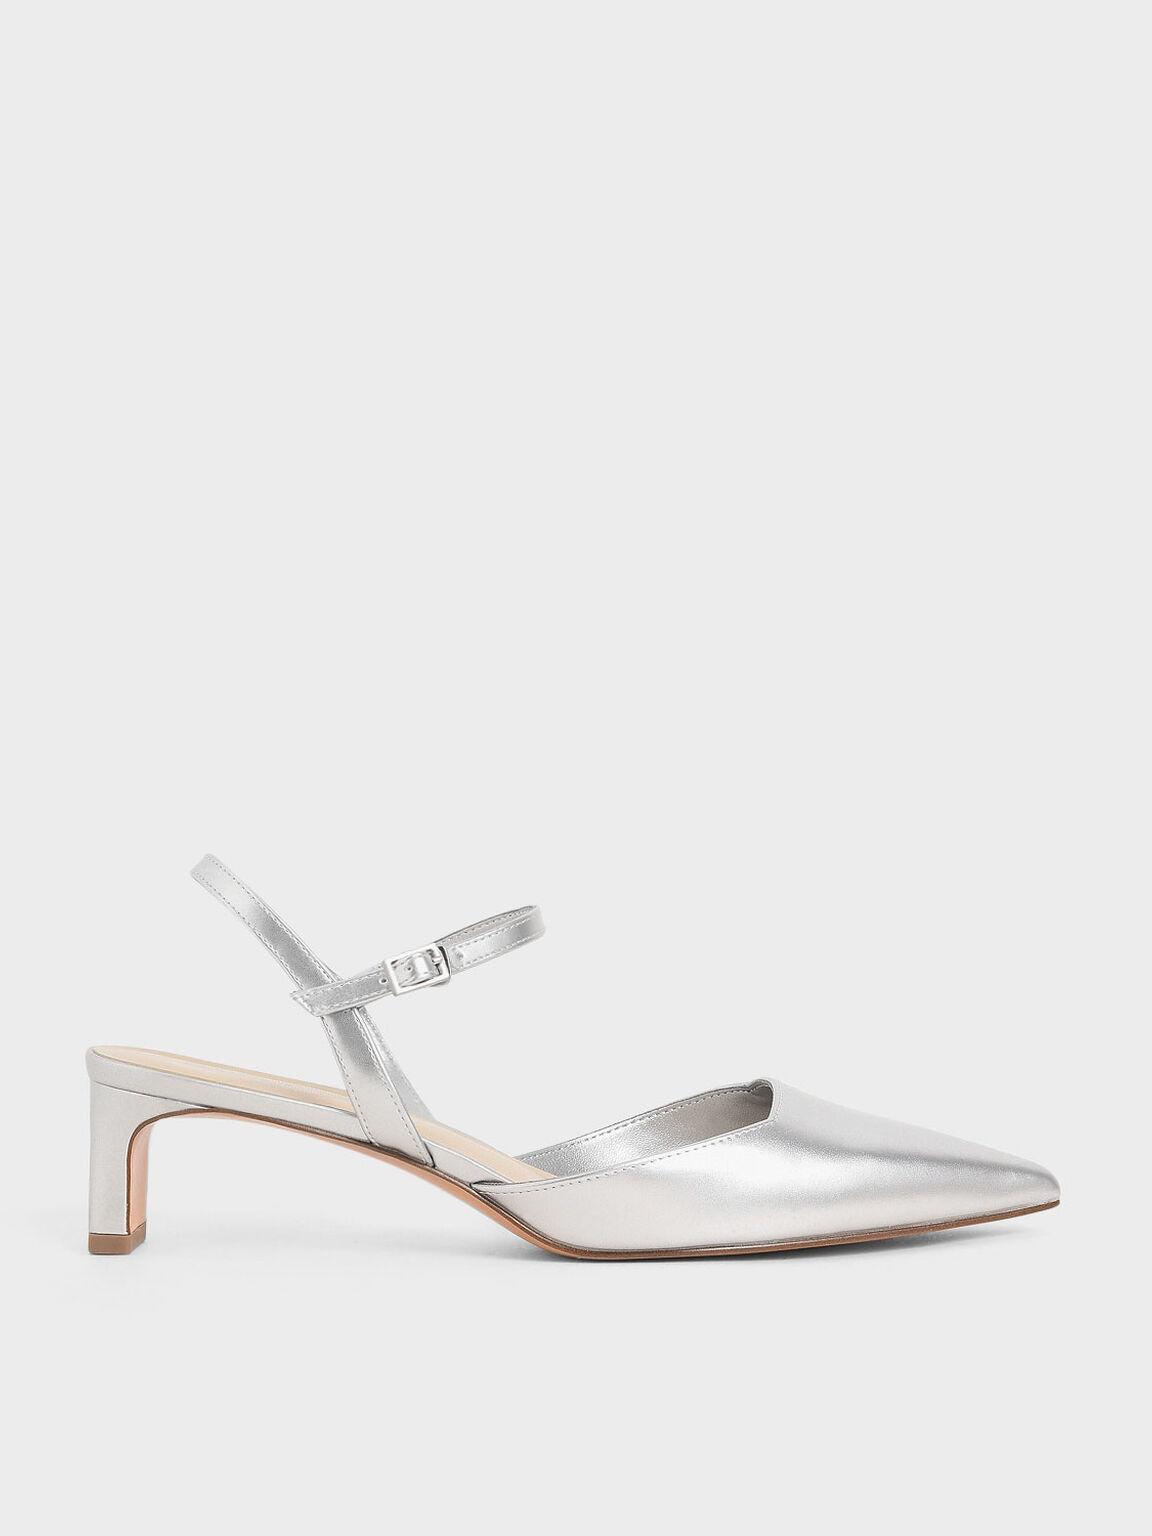 Metallic Ankle Strap Pumps, Silver, hi-res